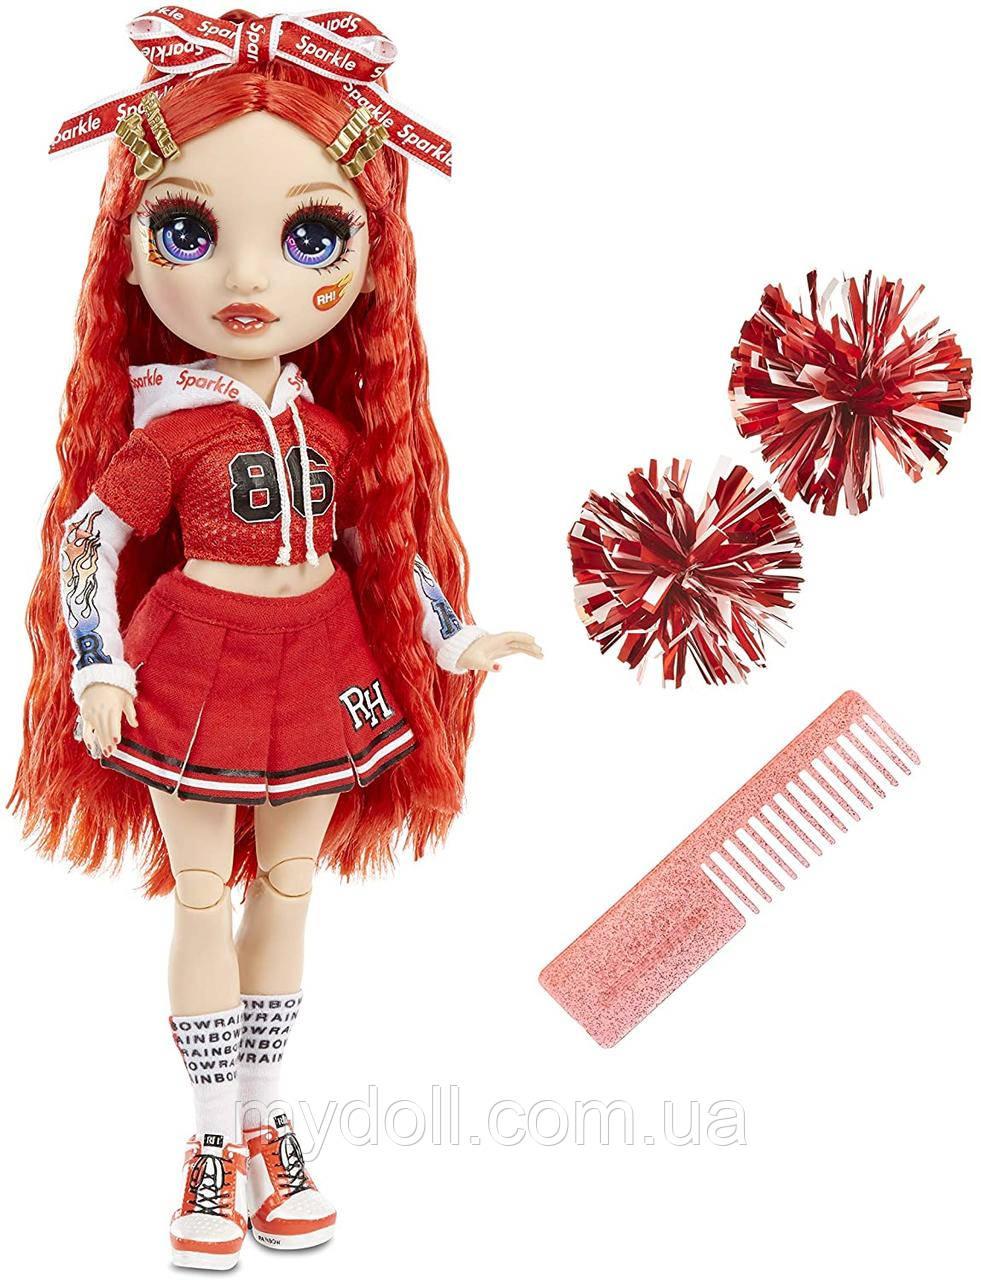 Кукла Рейнбоу Хай Руби Андерсон - Rainbow High Cheer Ruby Anderson 572039 Оригинал